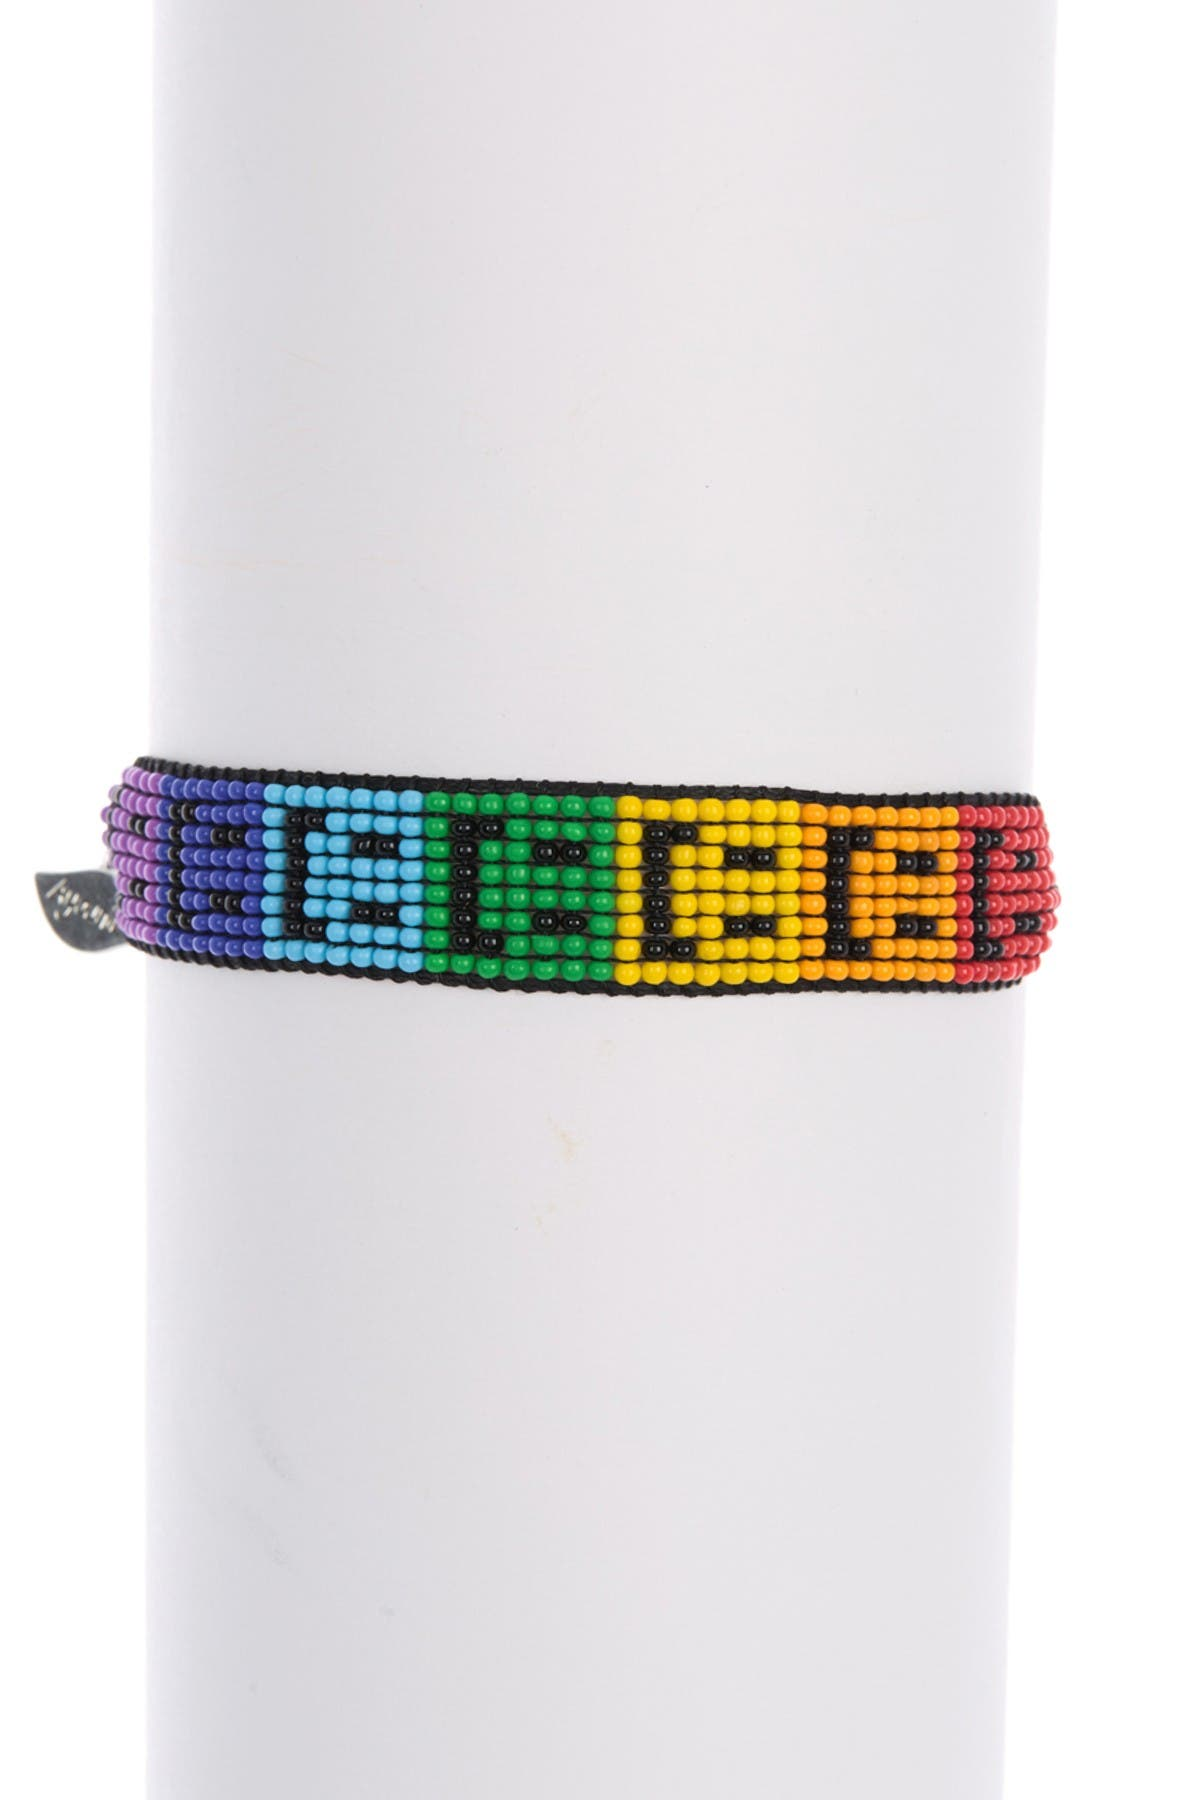 Image of AYOUNIK Rainbow Smiley Beaded Friendshp Bracelet